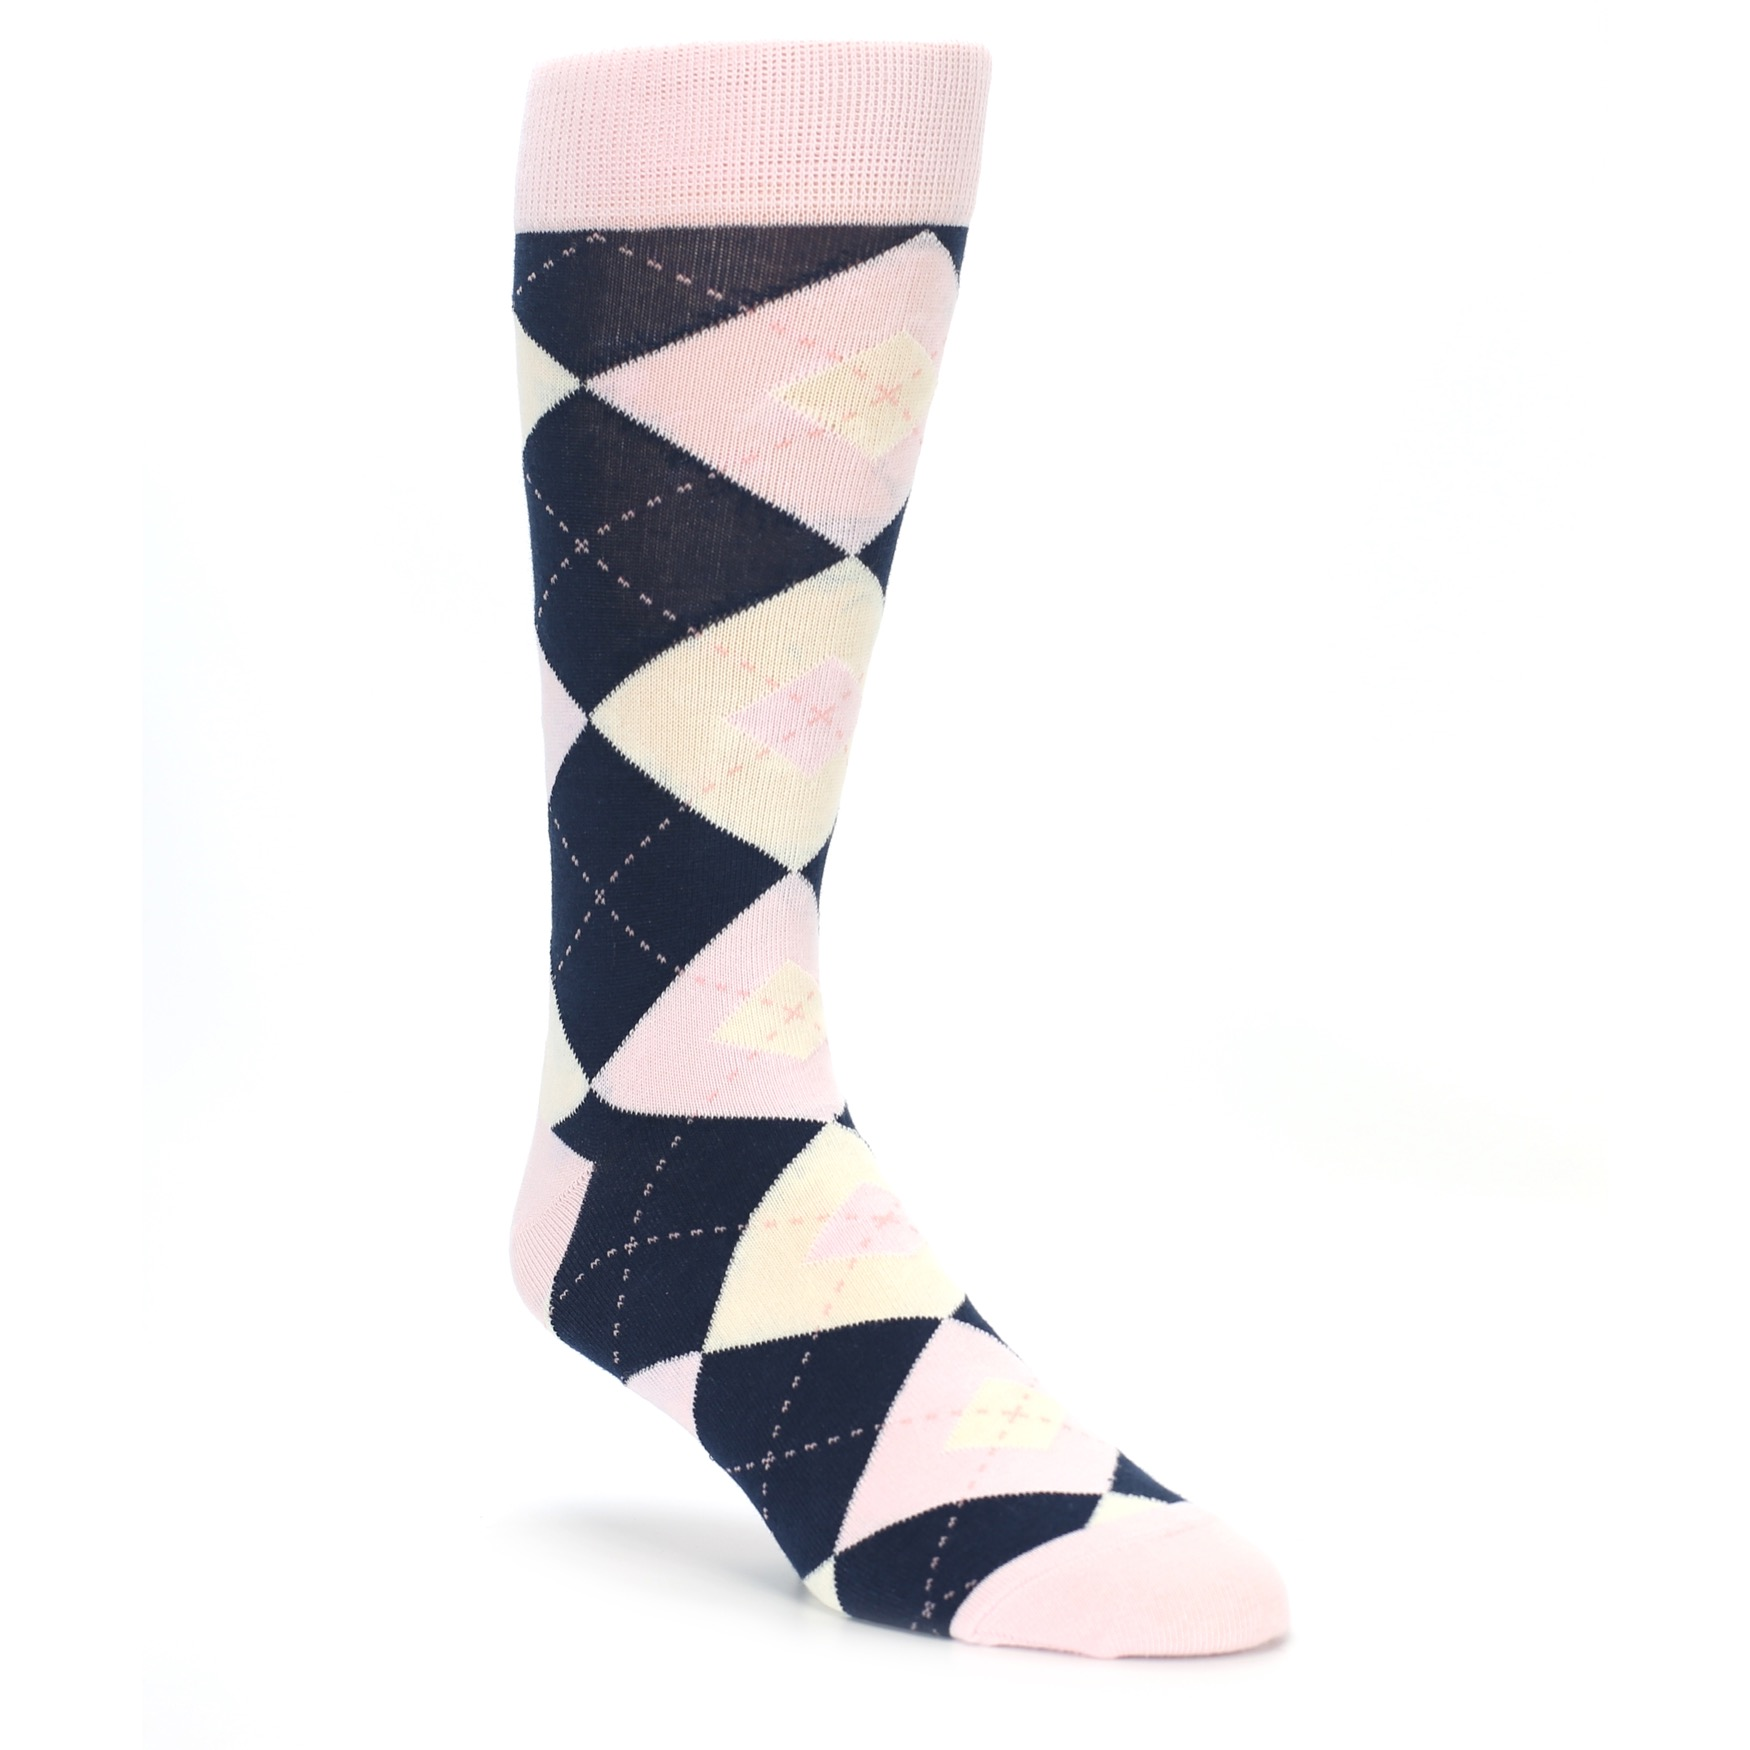 Petal Pink And Navy Argyle Wedding Socks For Groomsmen